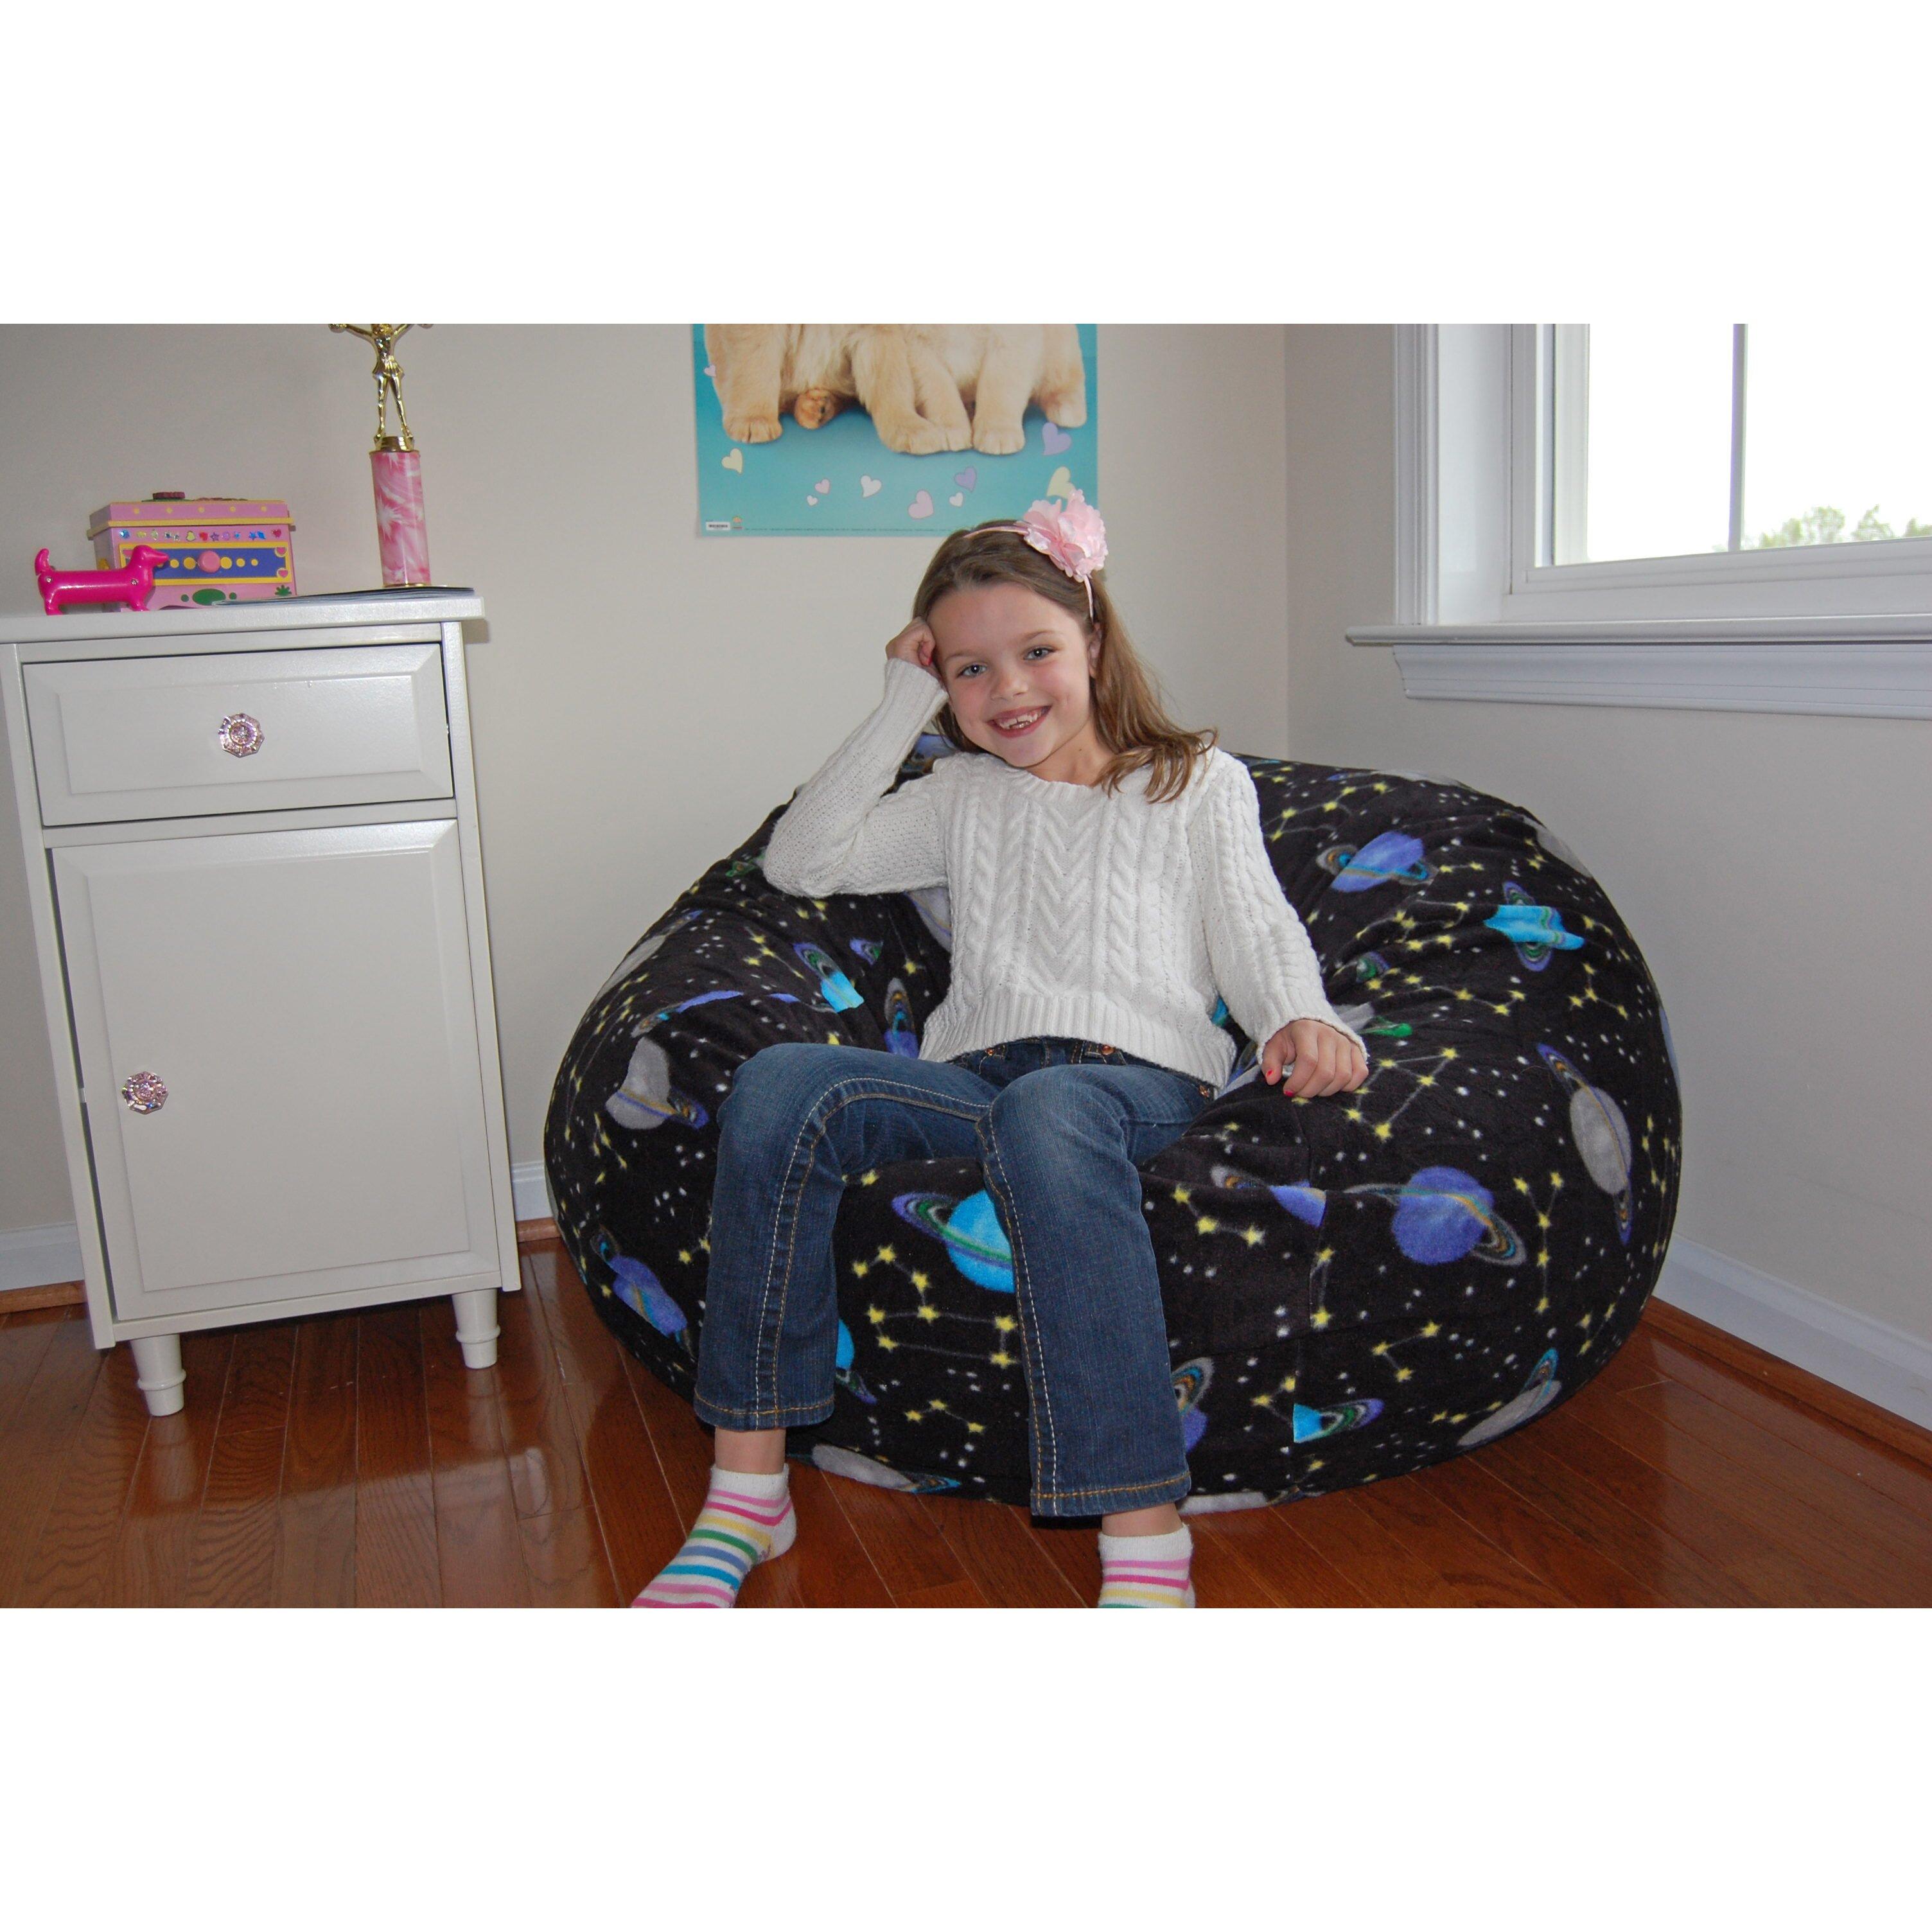 Baby Kids Playroom Bean Bag Chairs Ahh Products Sku Ahhp1001